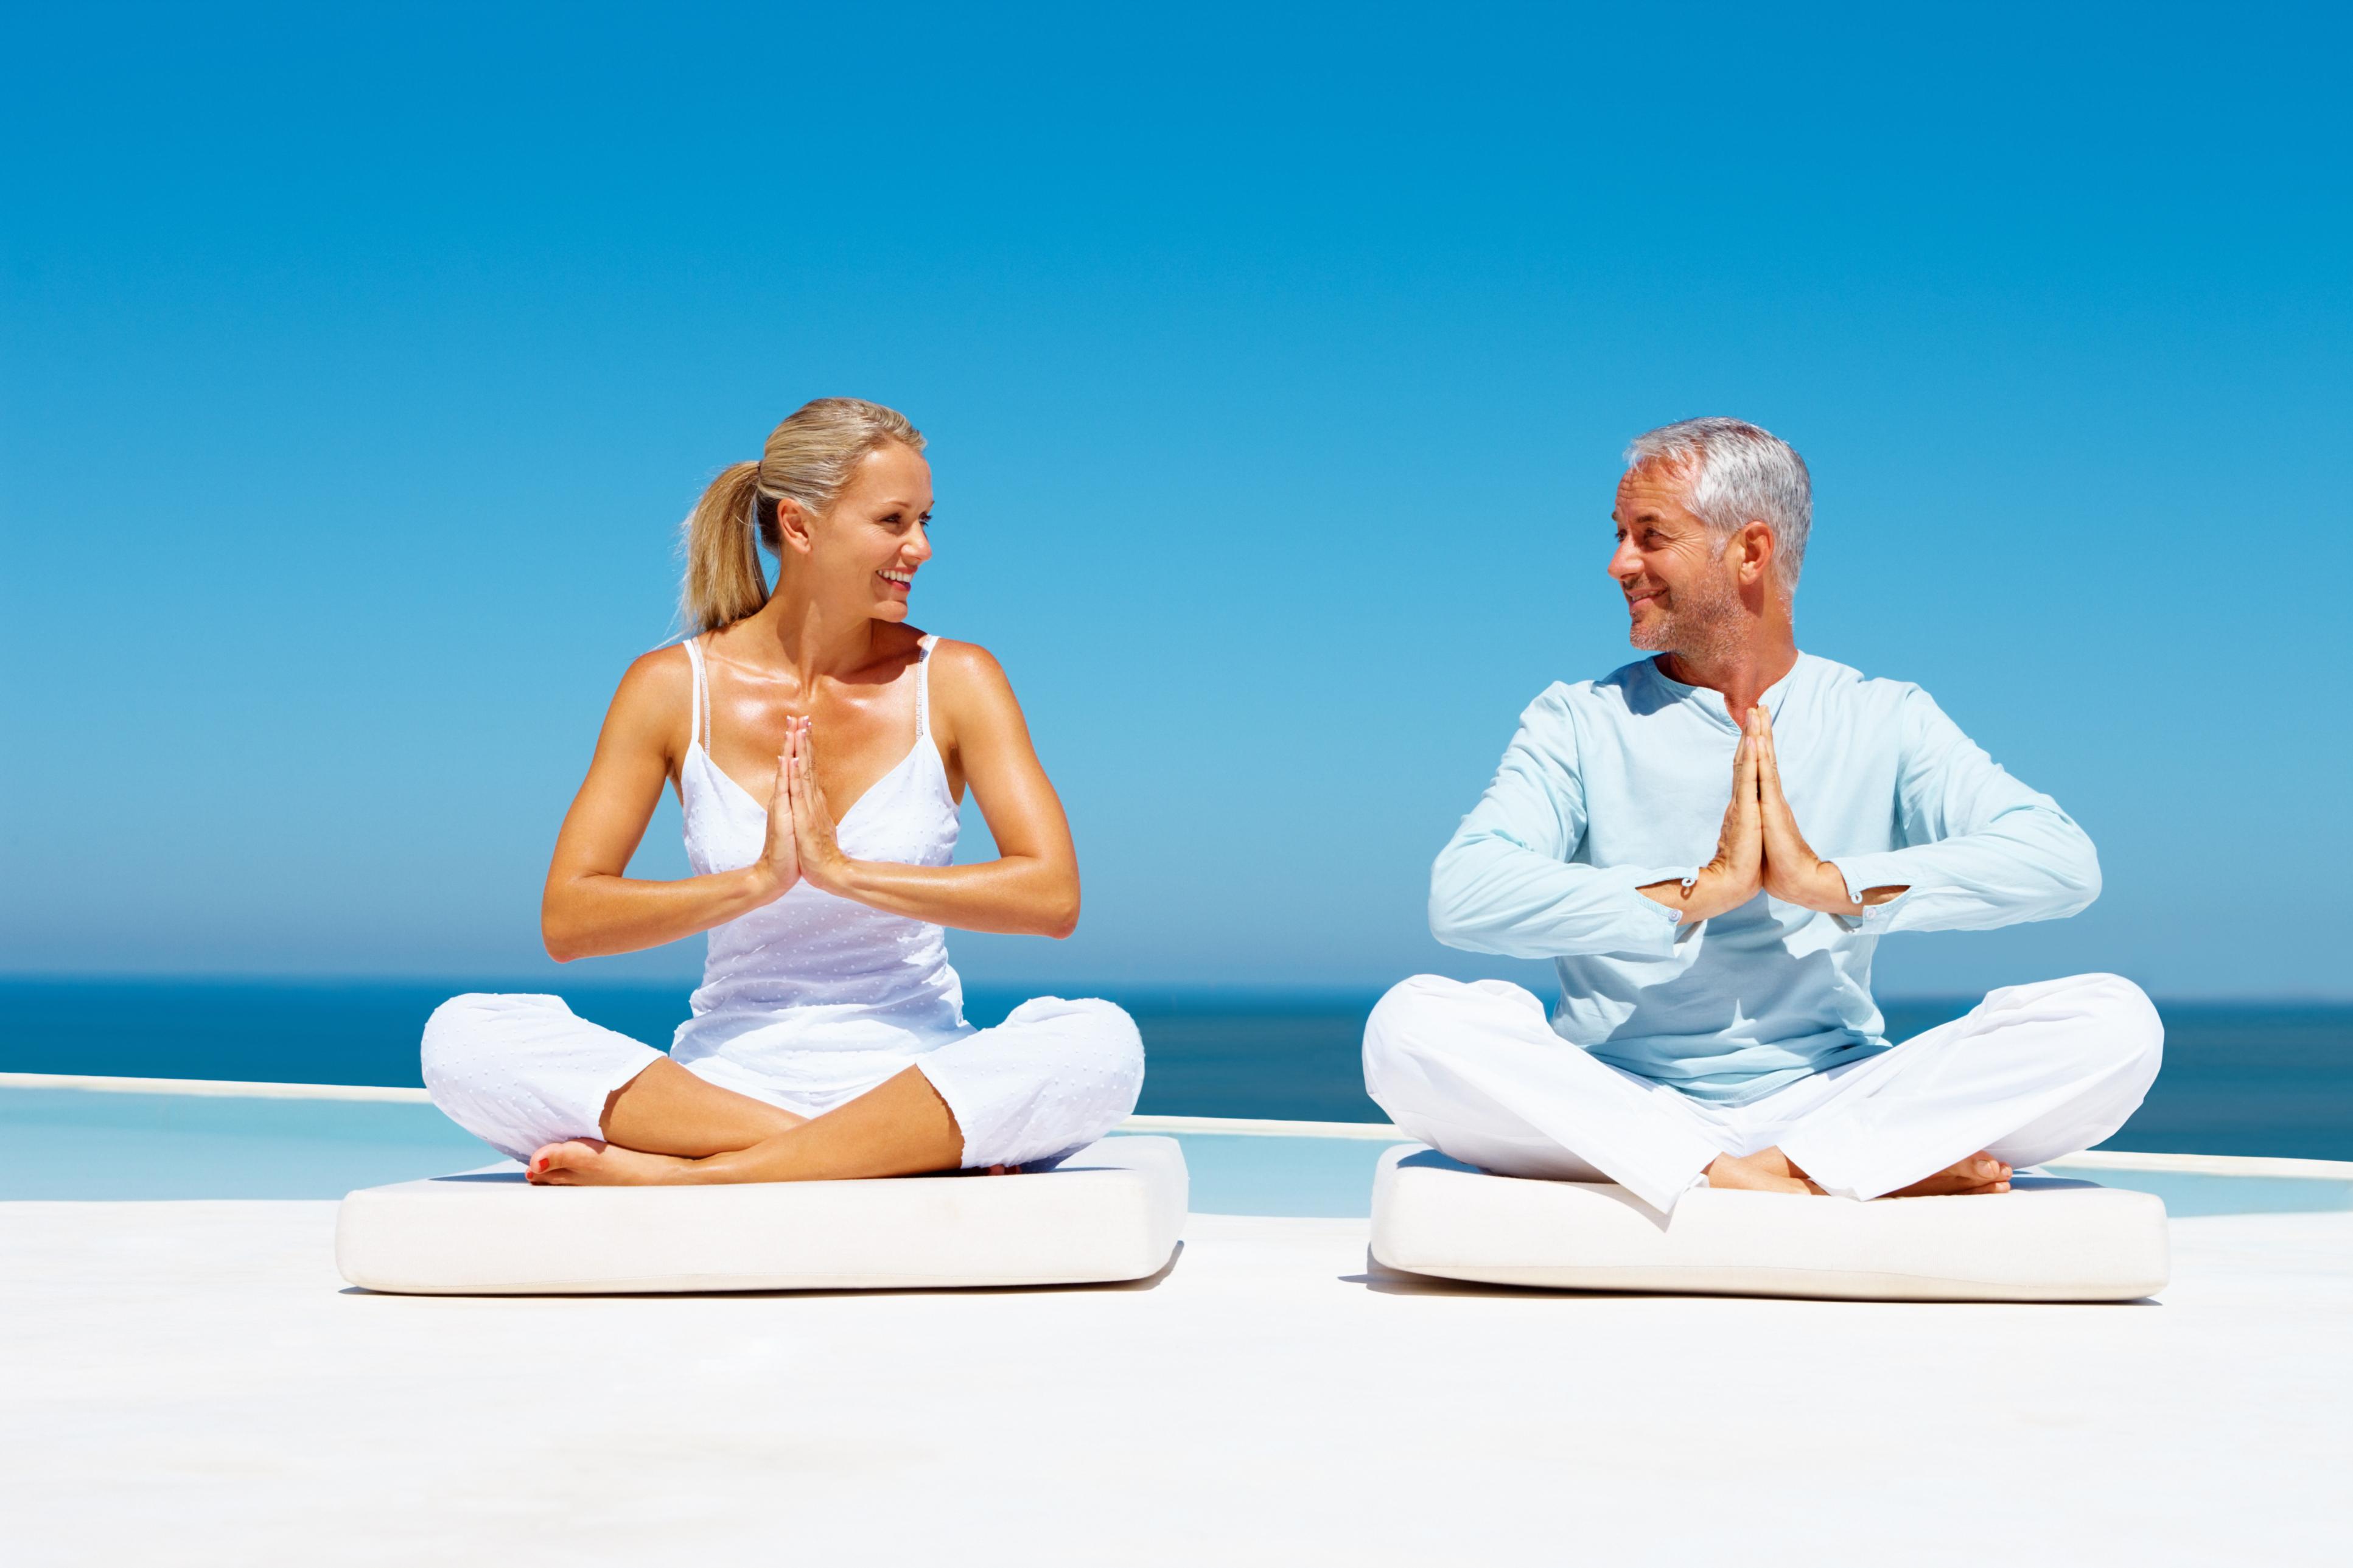 медитация на фото любимого время обряда